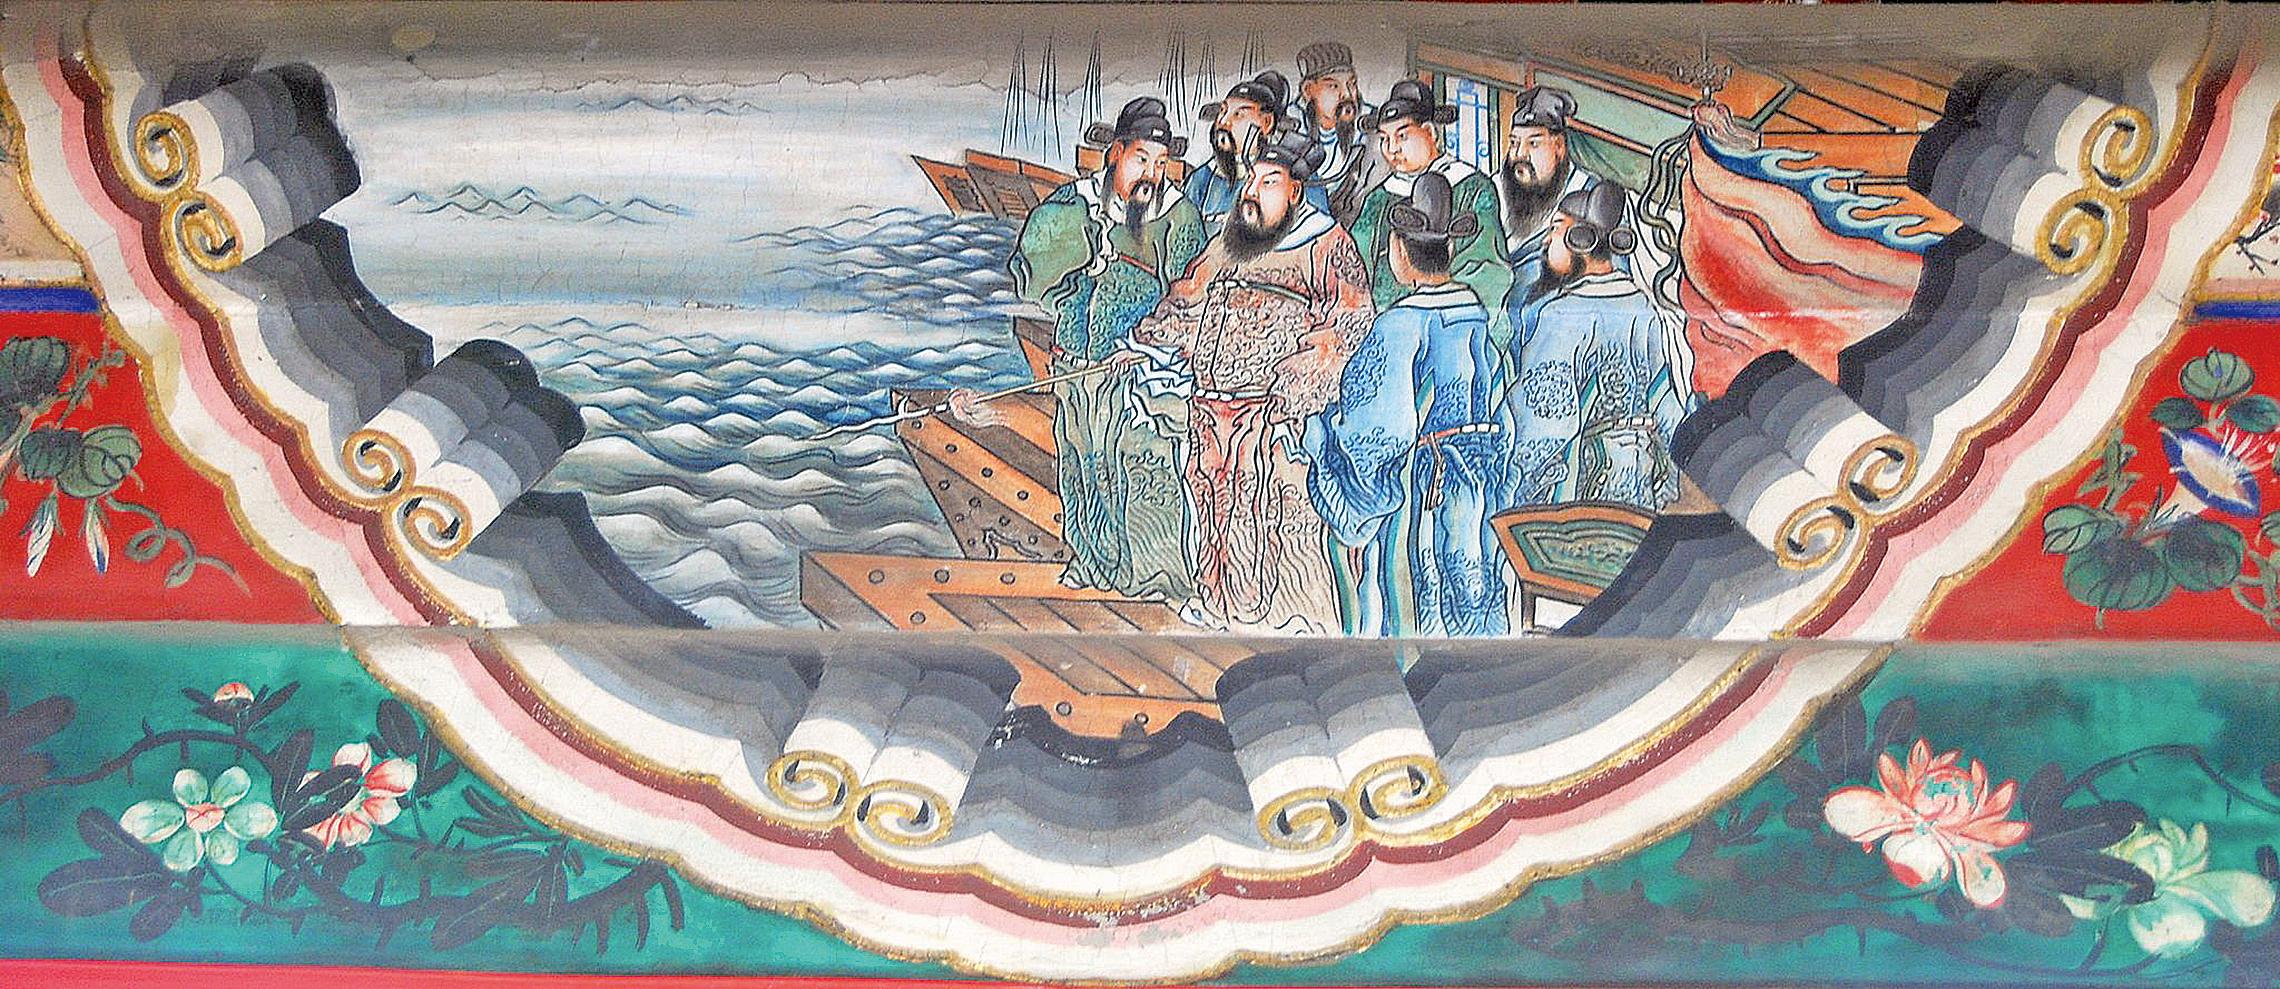 頤和園長廊彩繪:曹操執槊賦詩,吟誦《短歌行》(Shizhao/Wikimedia Commons)